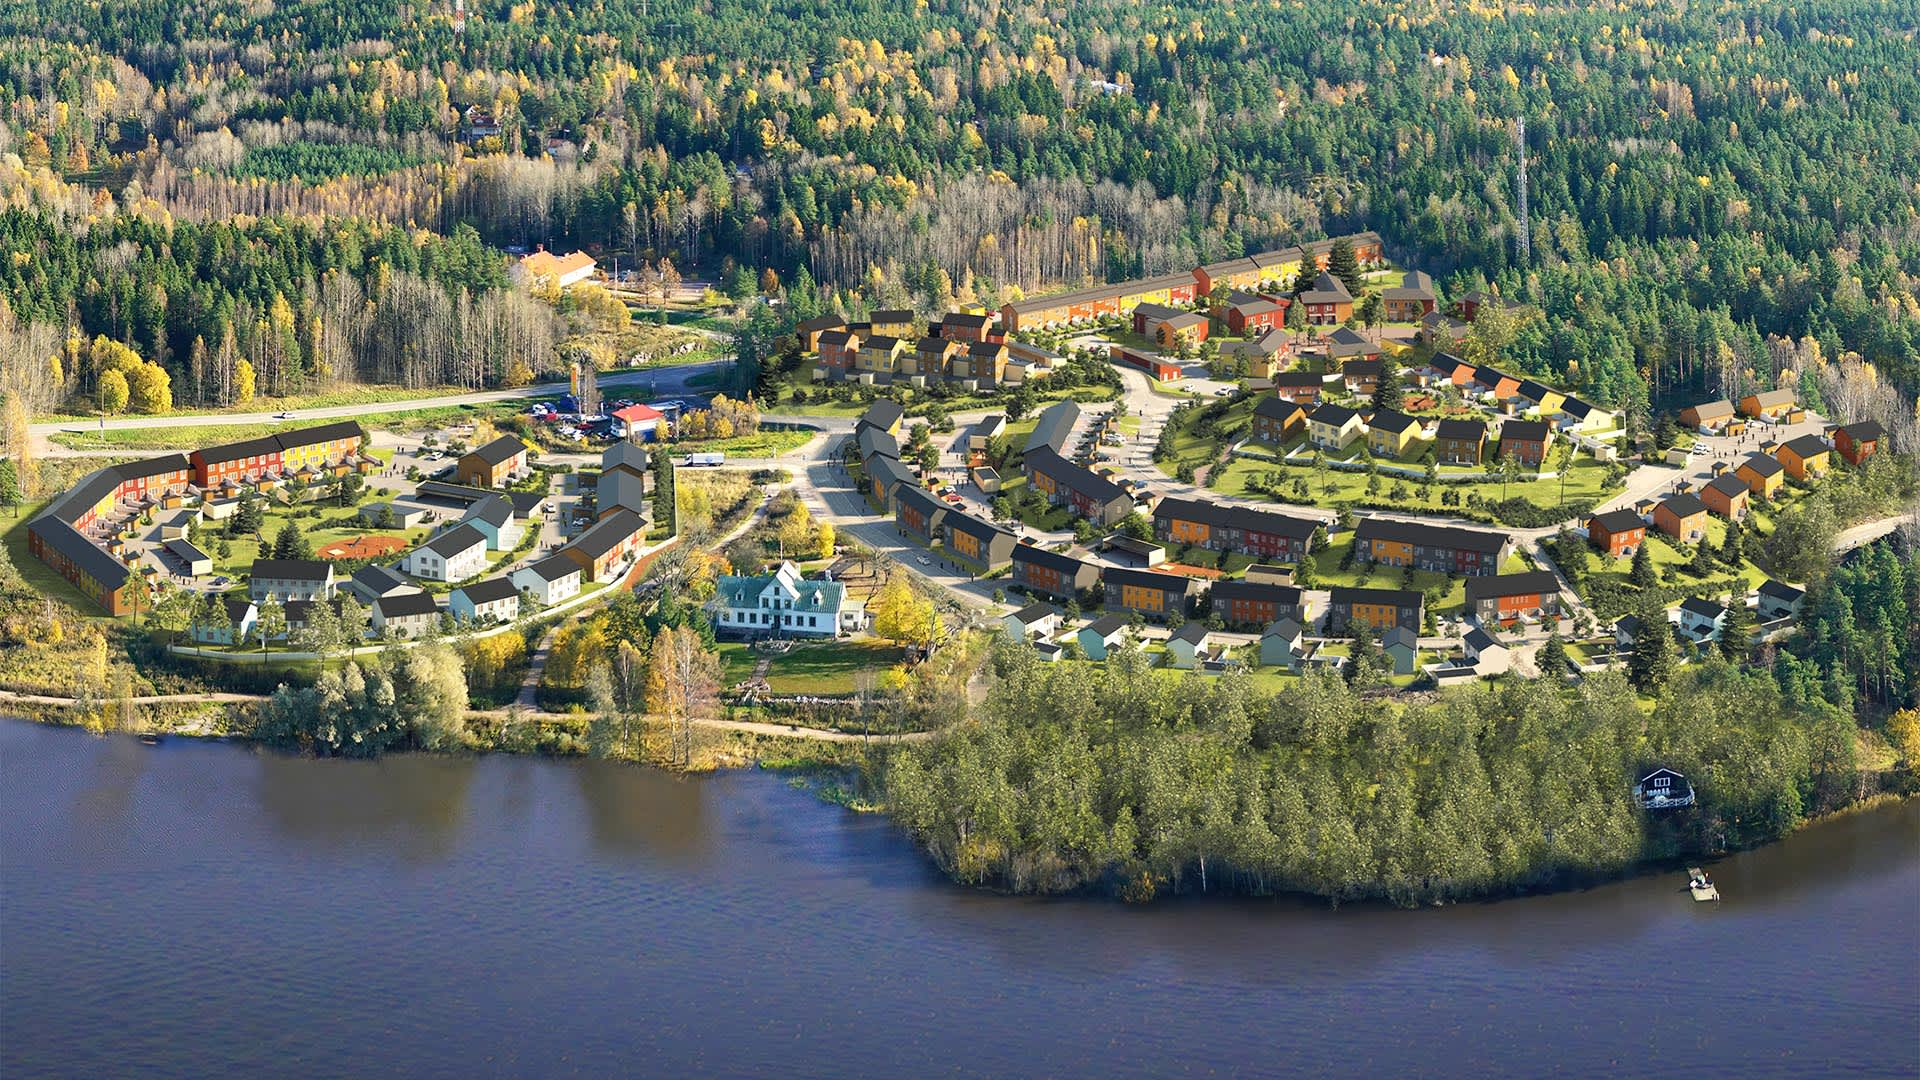 Houses for sale in Espoo - Asunto Oy Espoon Vuokko - Nupuri - YIT